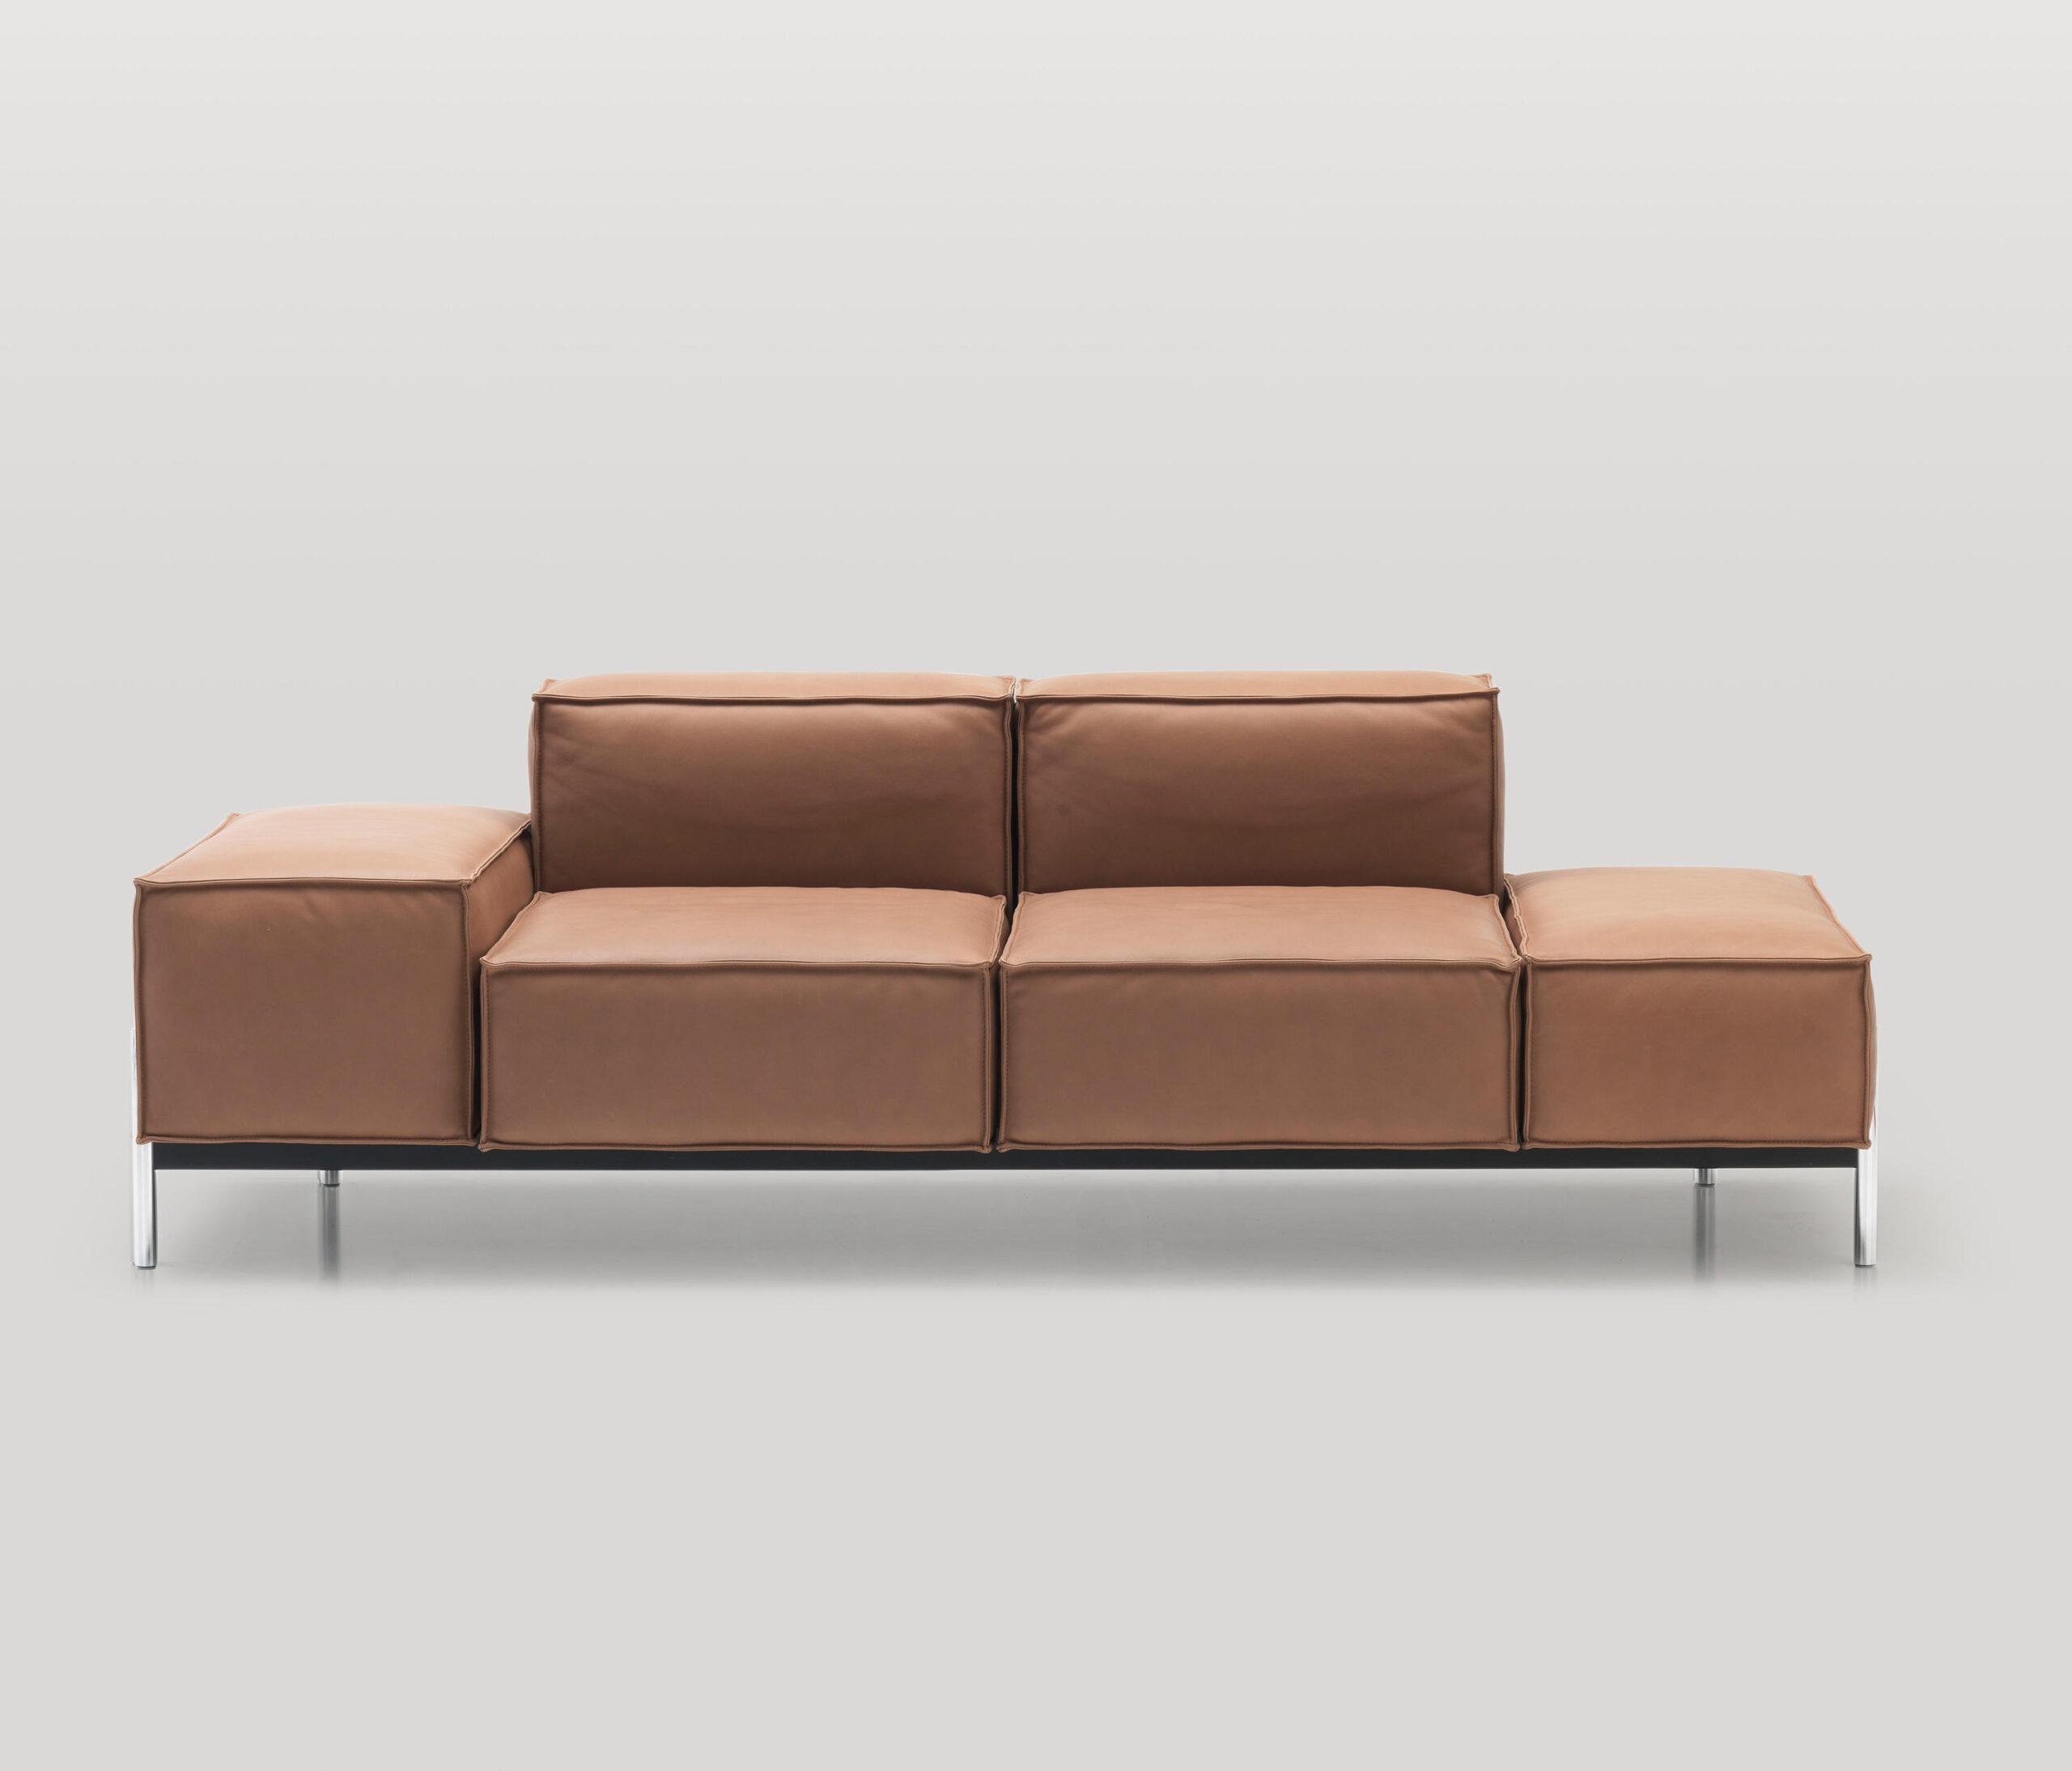 Full Size of De Sede Sofa For Sale Endless Ds 600 By Preis Furniture Usa Gebraucht Kaufen 21 Sofas From Architonic Hotel Bad Rothenfelde Mondo Kommode Weiß Hochglanz Sofa De Sede Sofa